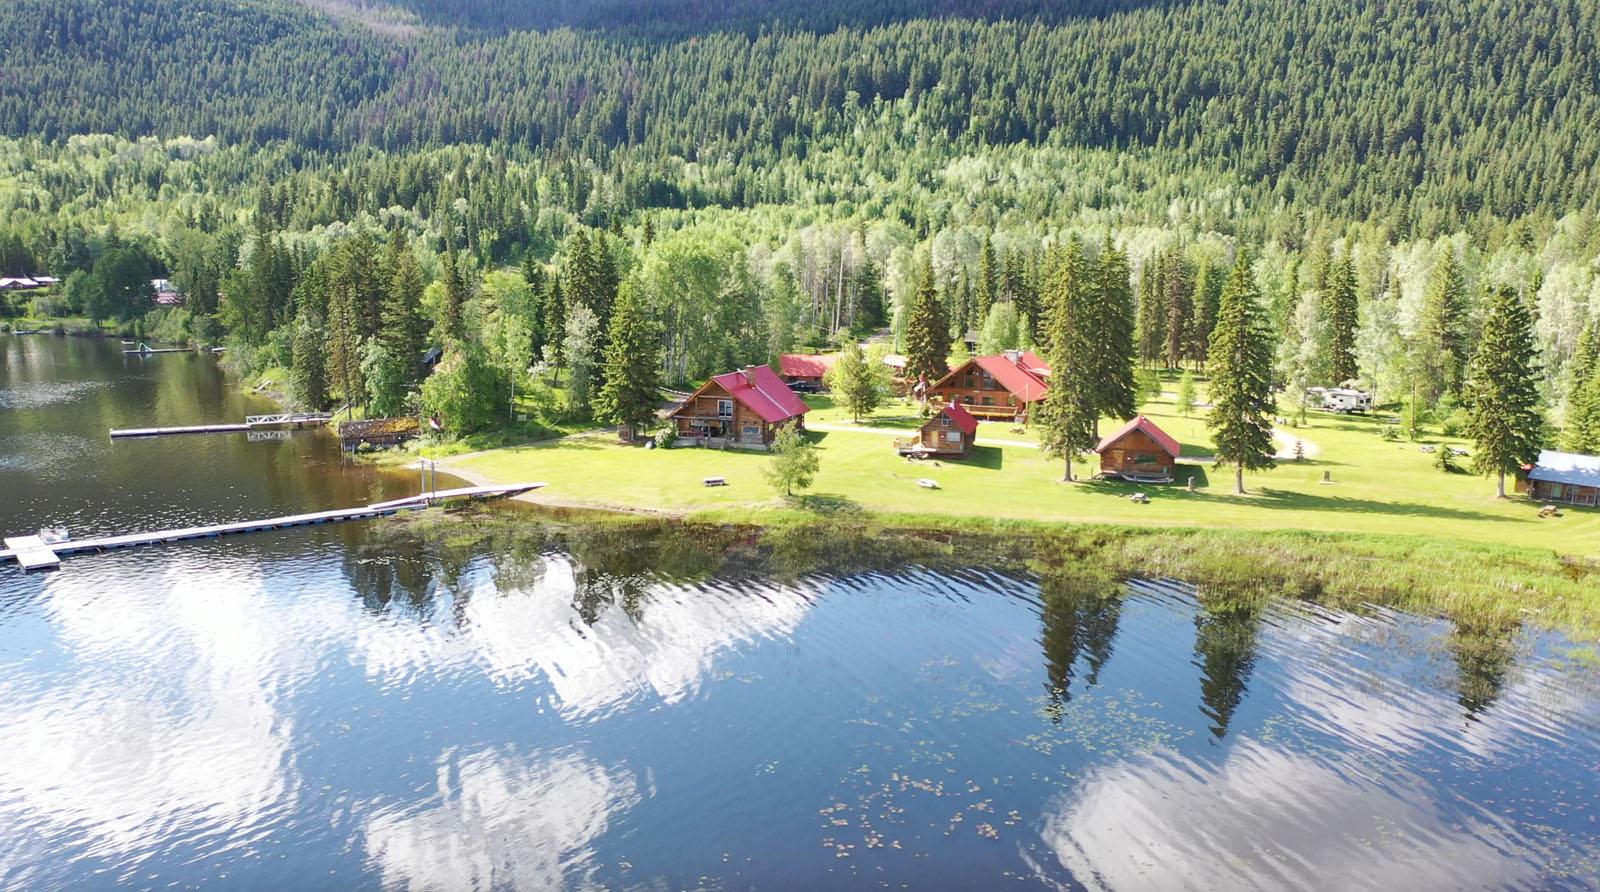 Canim lake resort 12